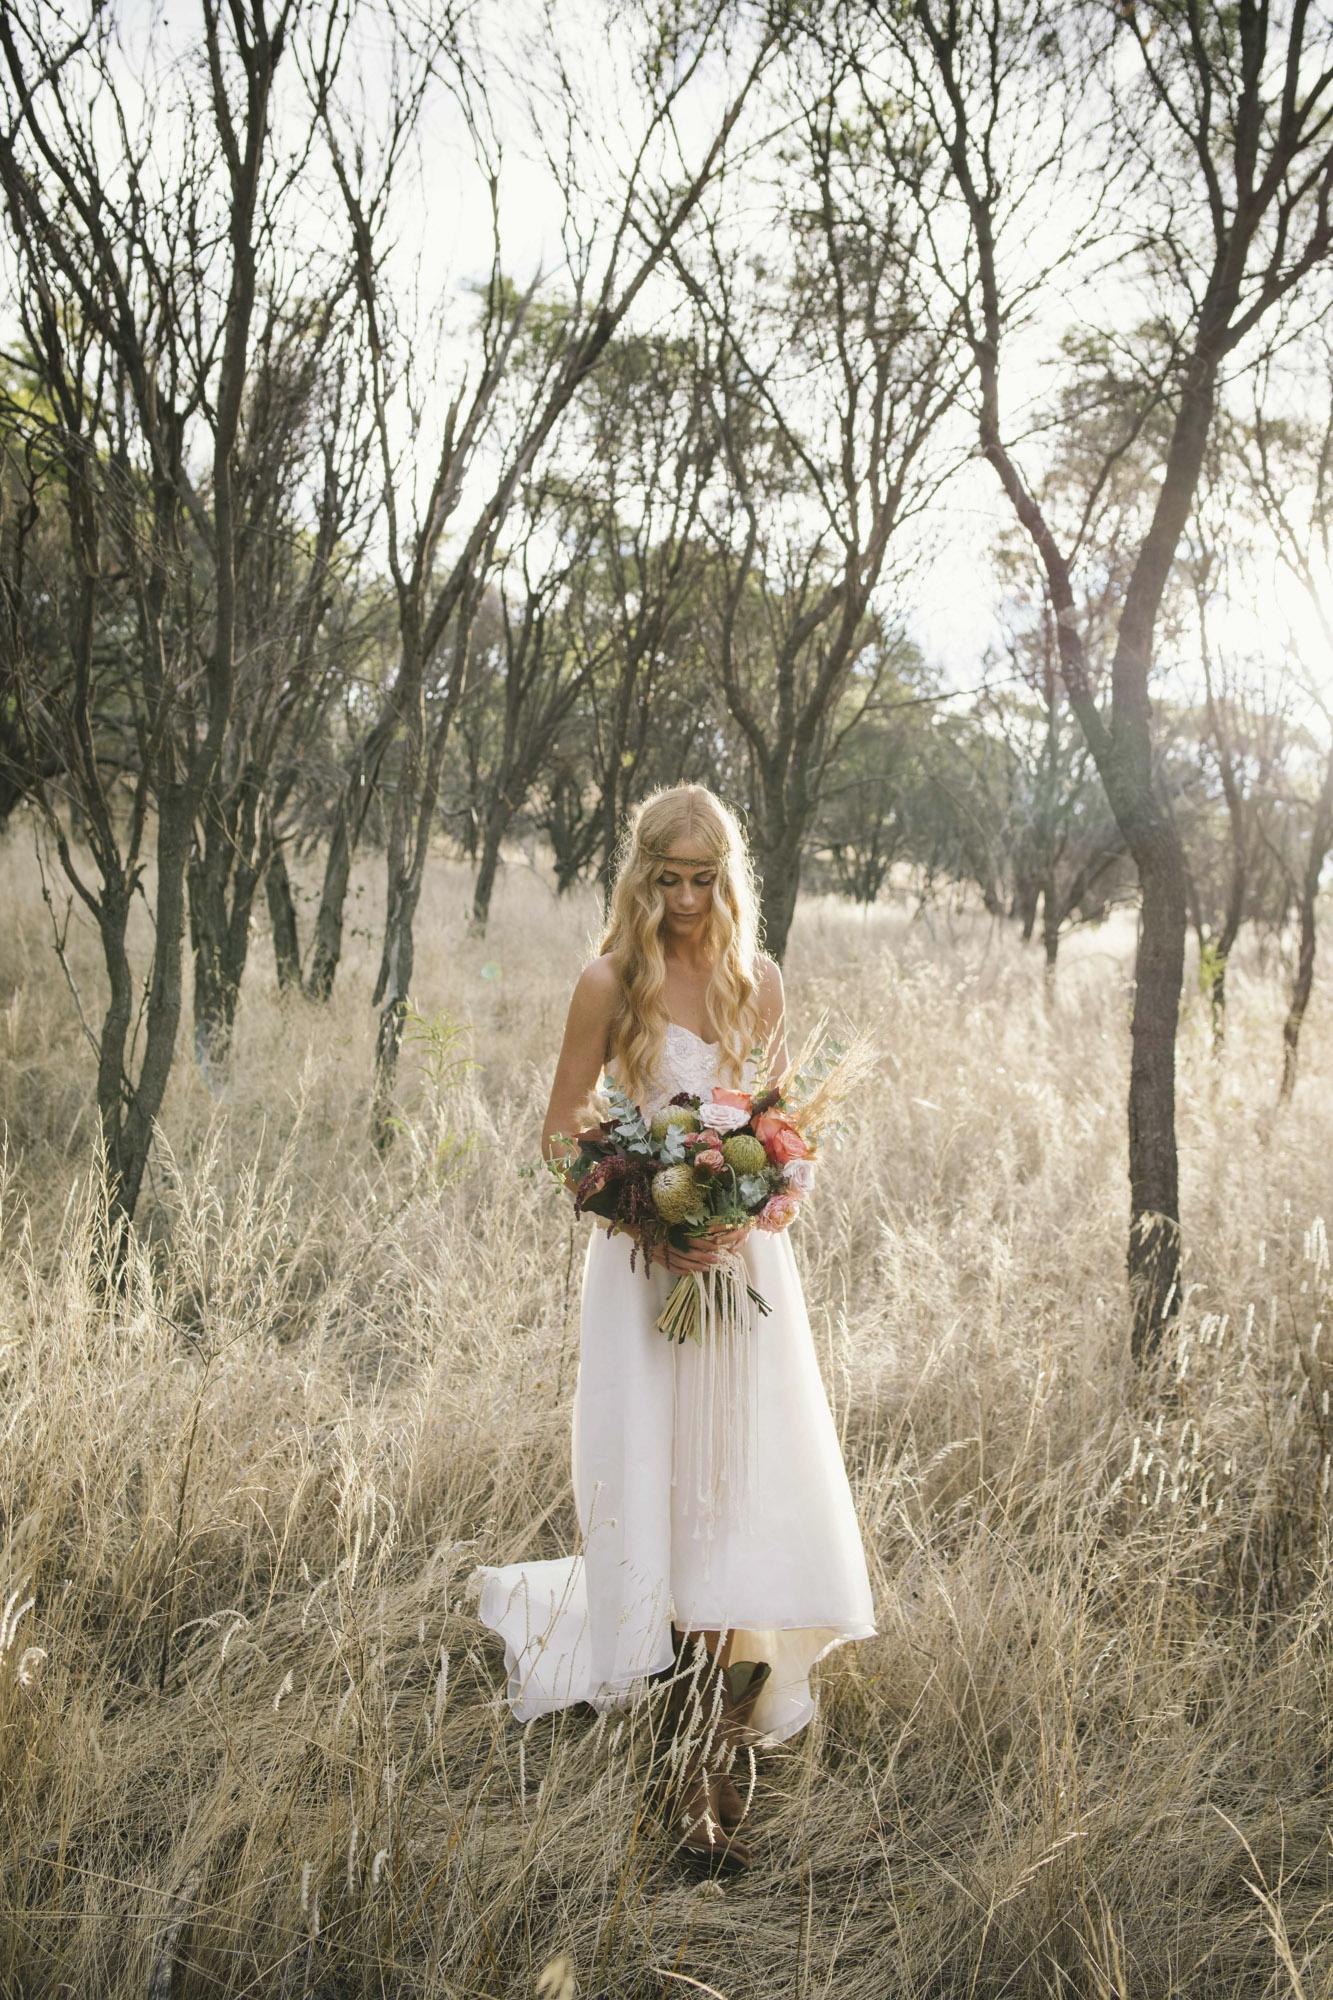 Angie-Roe-Photography-Wedding-Perth-Northam-Wheatbelt-Country-Rural (74).jpg